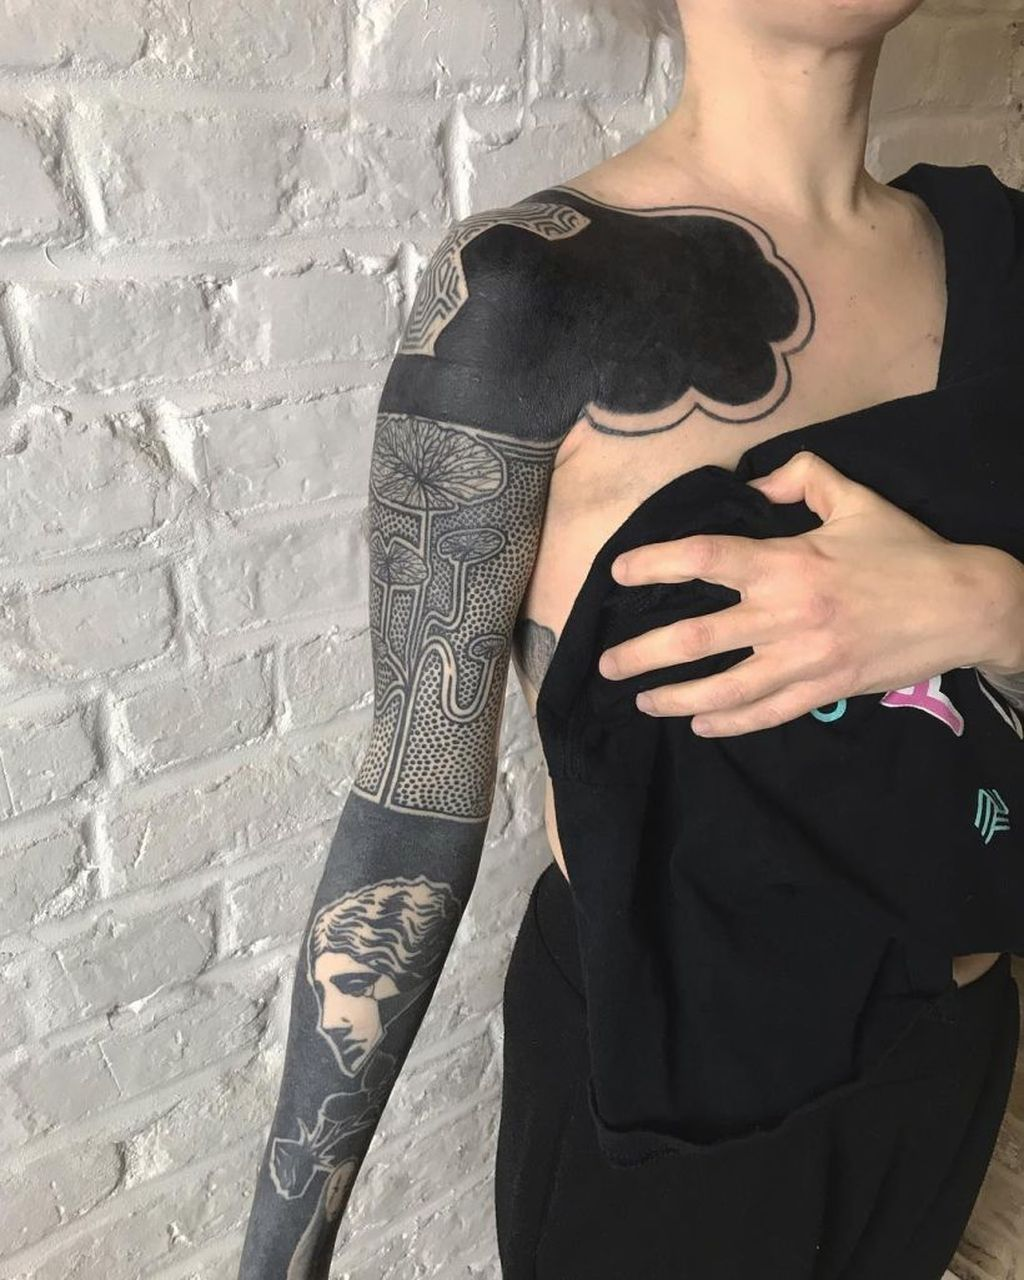 30 Classy Sleeve Tattoo Design Ideas To Inspire For Women Solid Black Tattoo Black Sleeve Tattoo Sleeve Tattoos